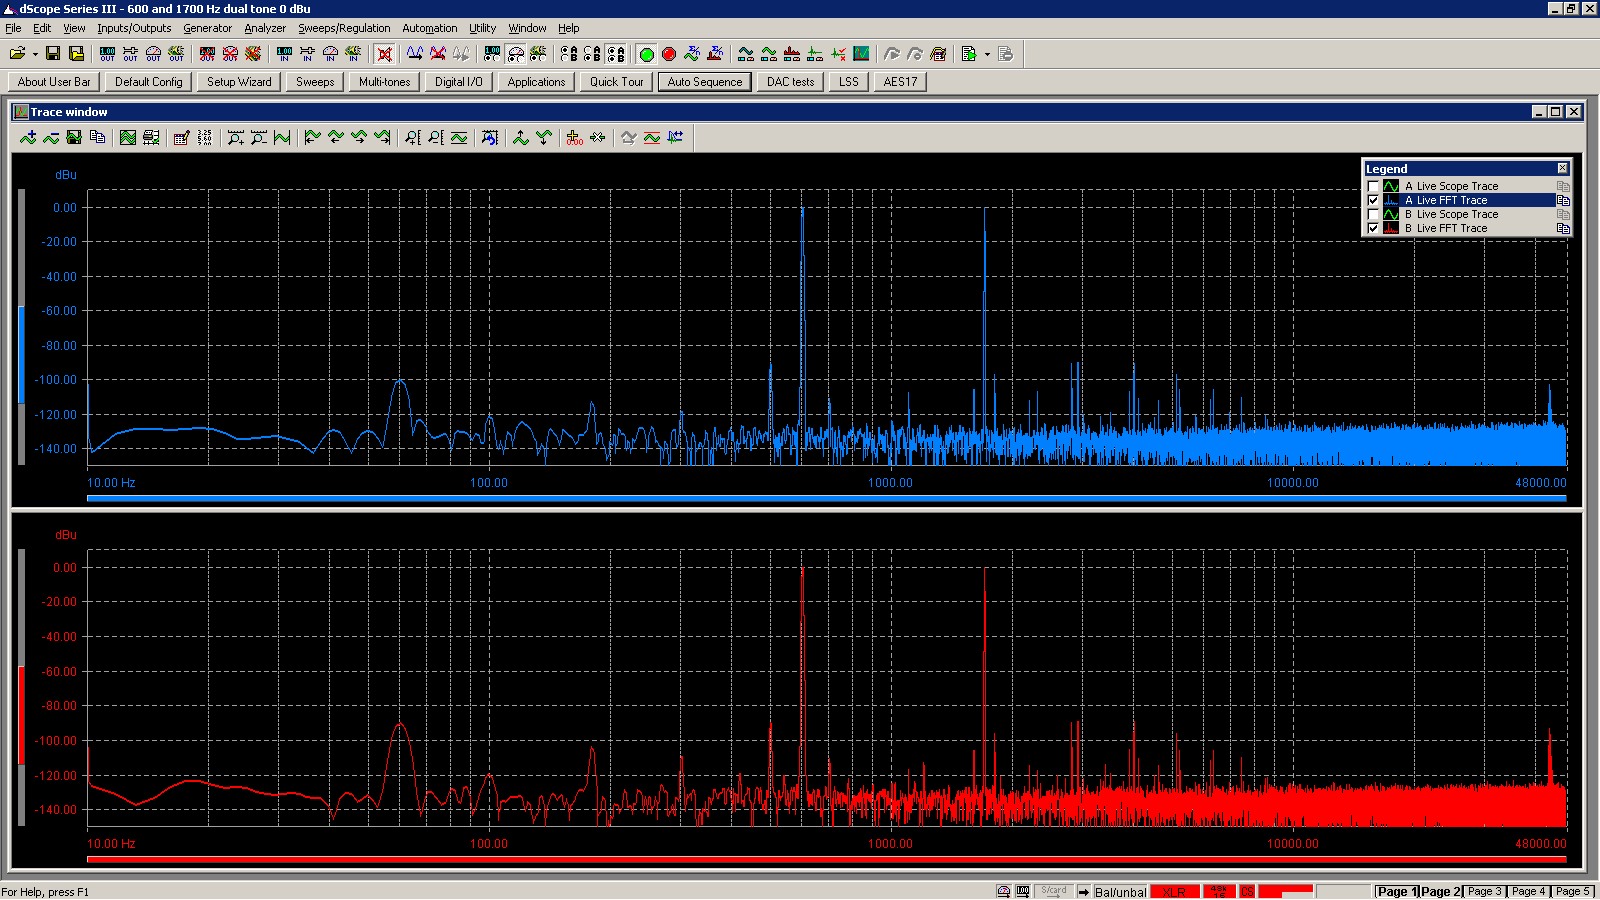 20160905 Jotunheim 600+1700Hz dual tone 0dBu 30R Bal.png